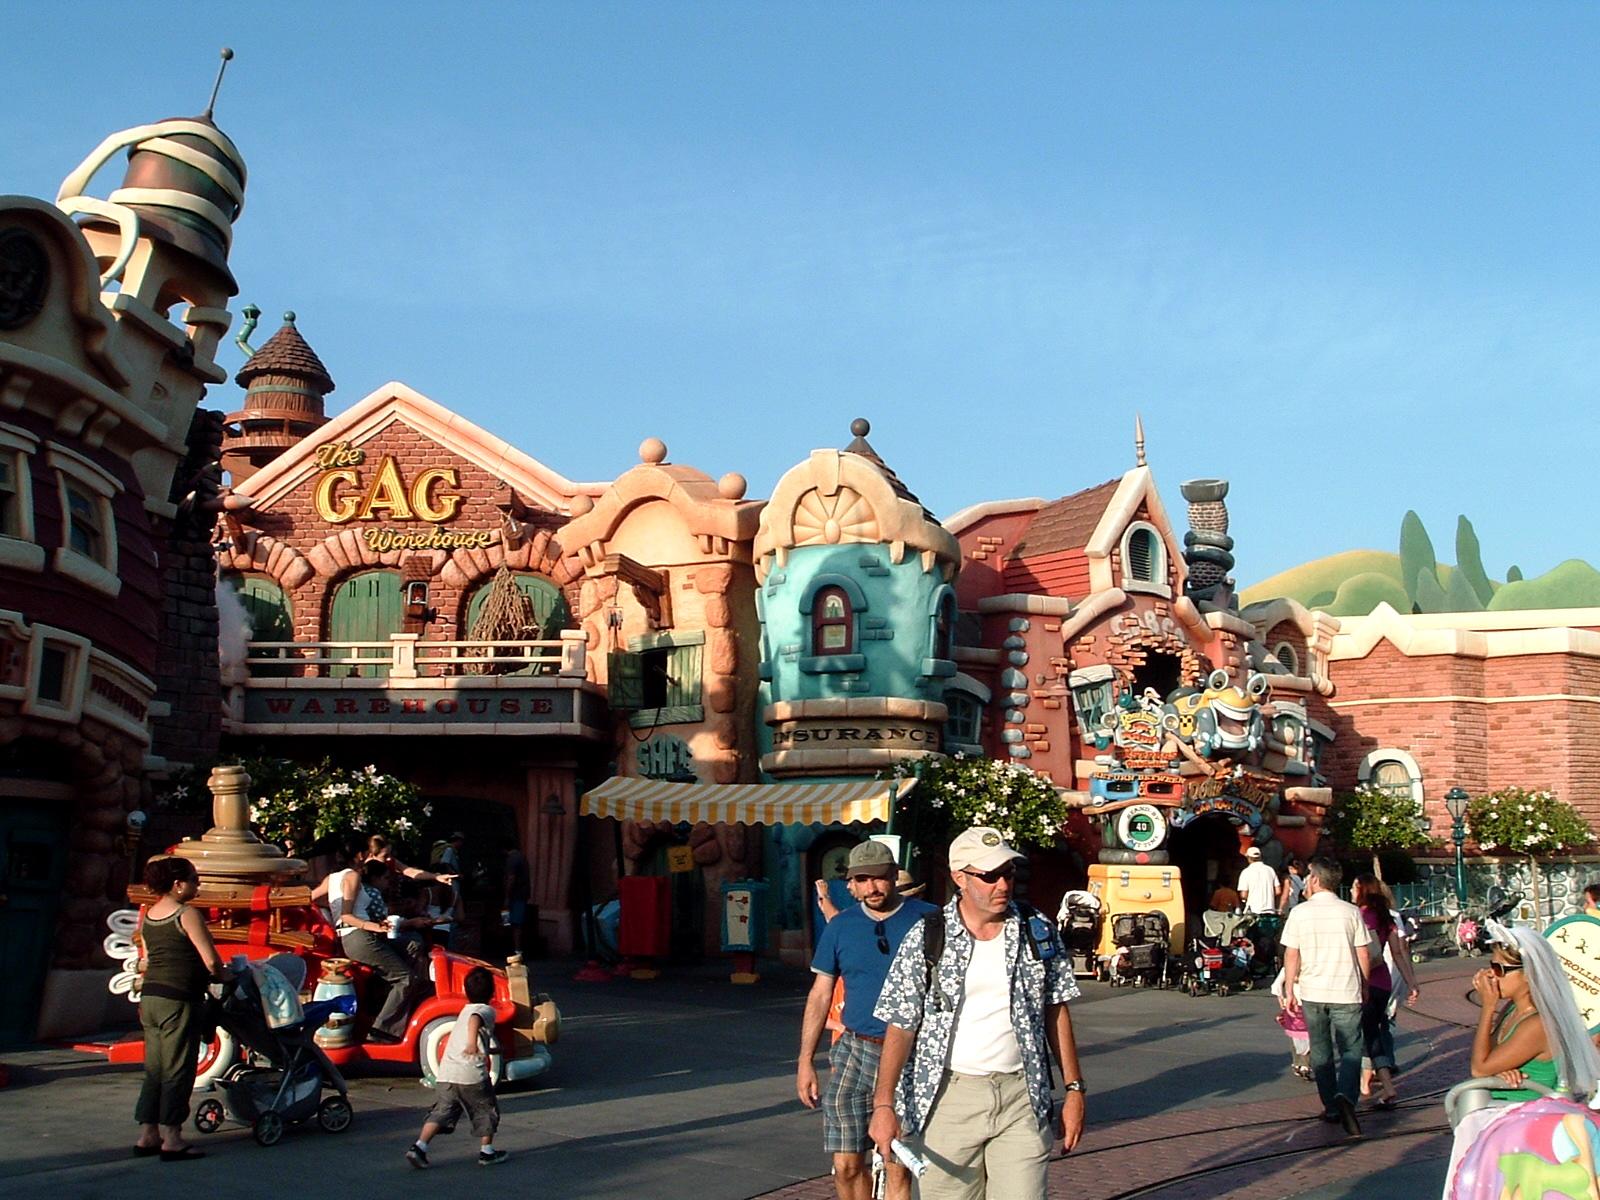 Downtown Toontown in Disneyland